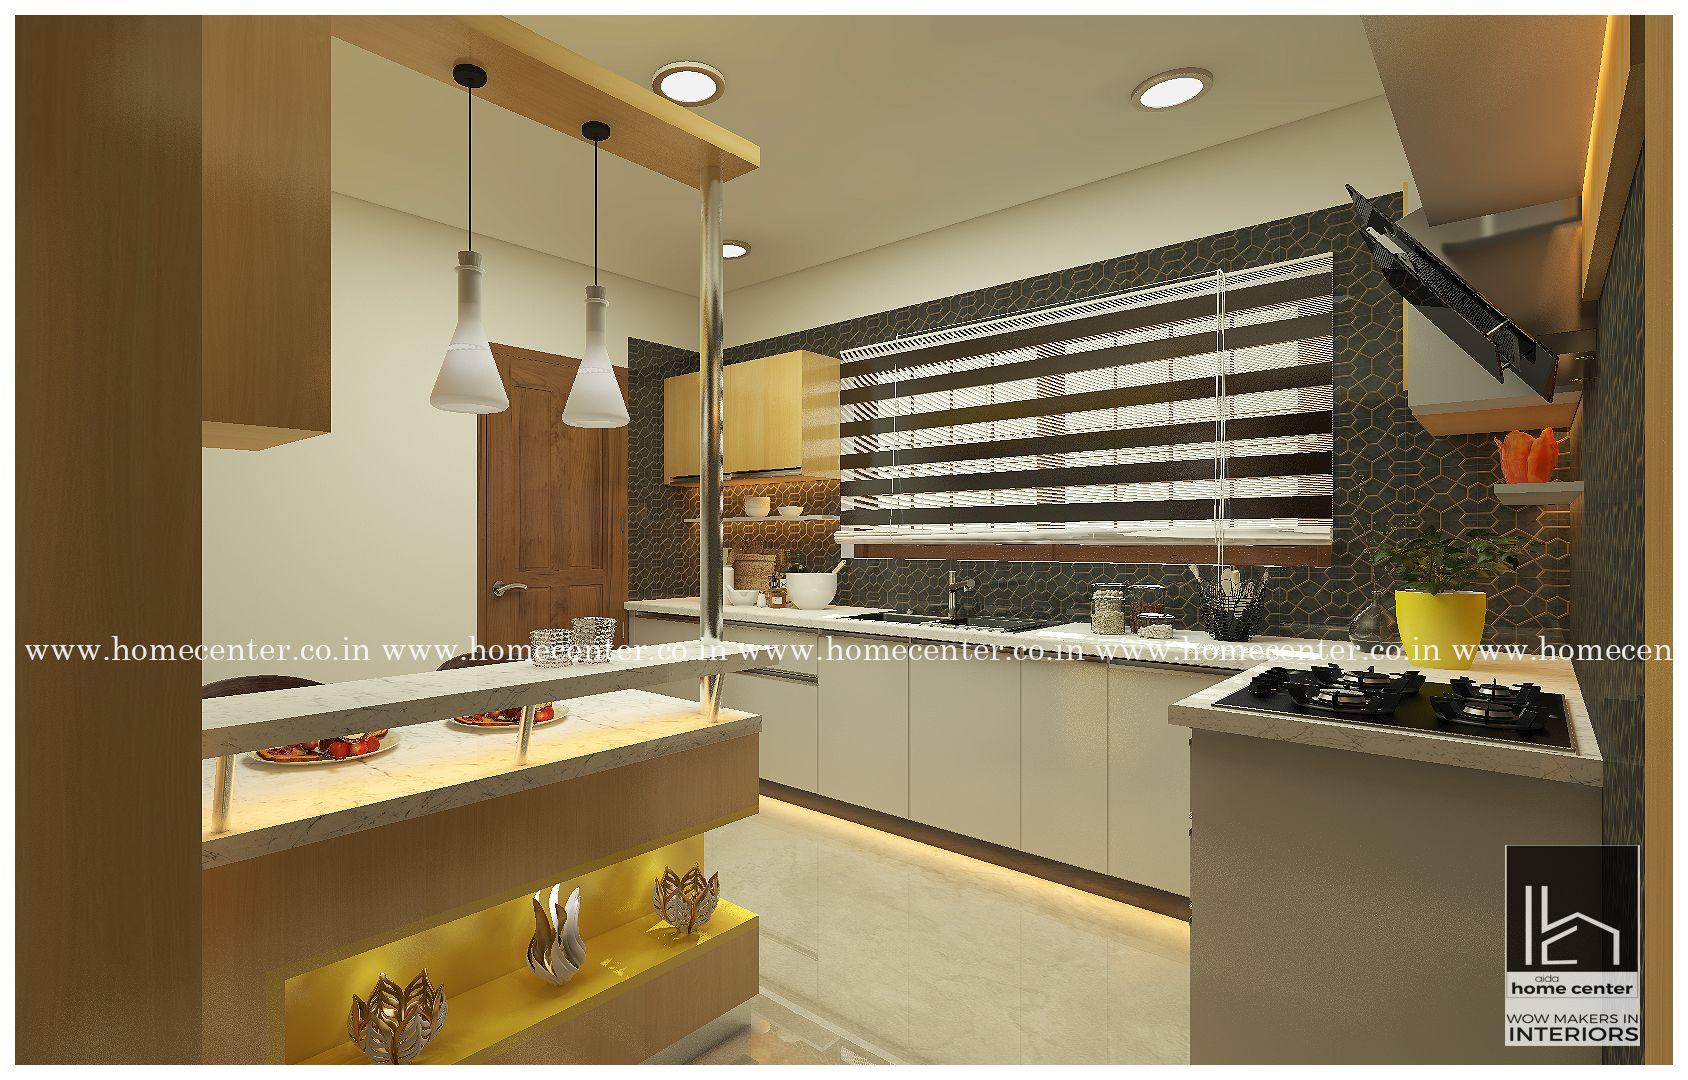 Superb Home Center Interiors Is The Best Interior Design Company In Interior Design Ideas Tzicisoteloinfo